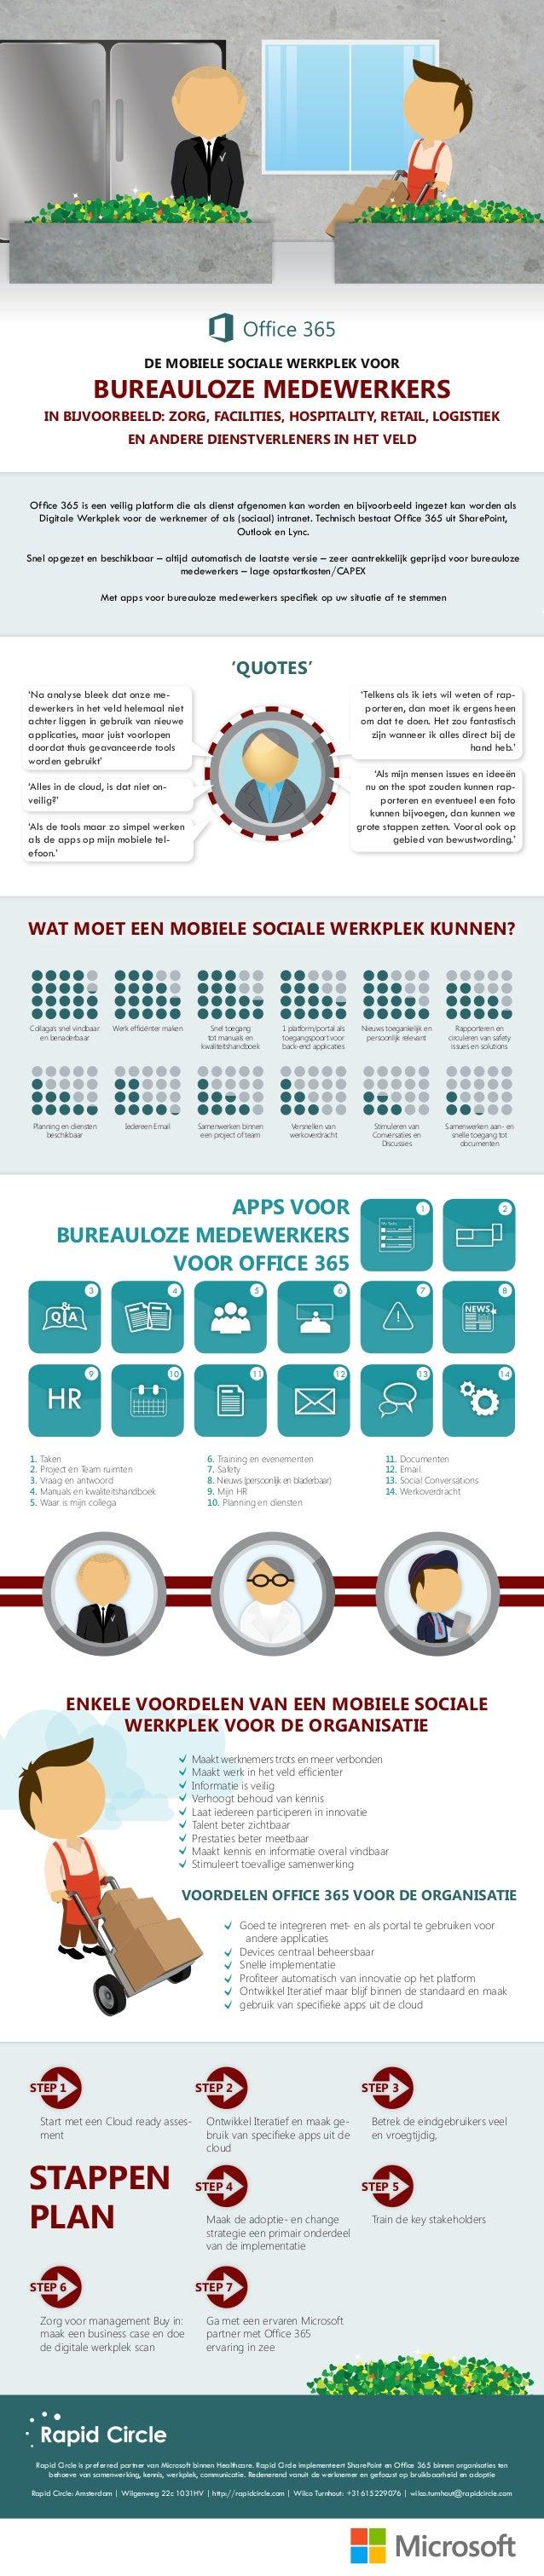 Waarom Office 365 voor logistiek, facilities, hospitality en consumenten dienstverlening in het veld -  Social Intranet and digital workplace for deskless workers